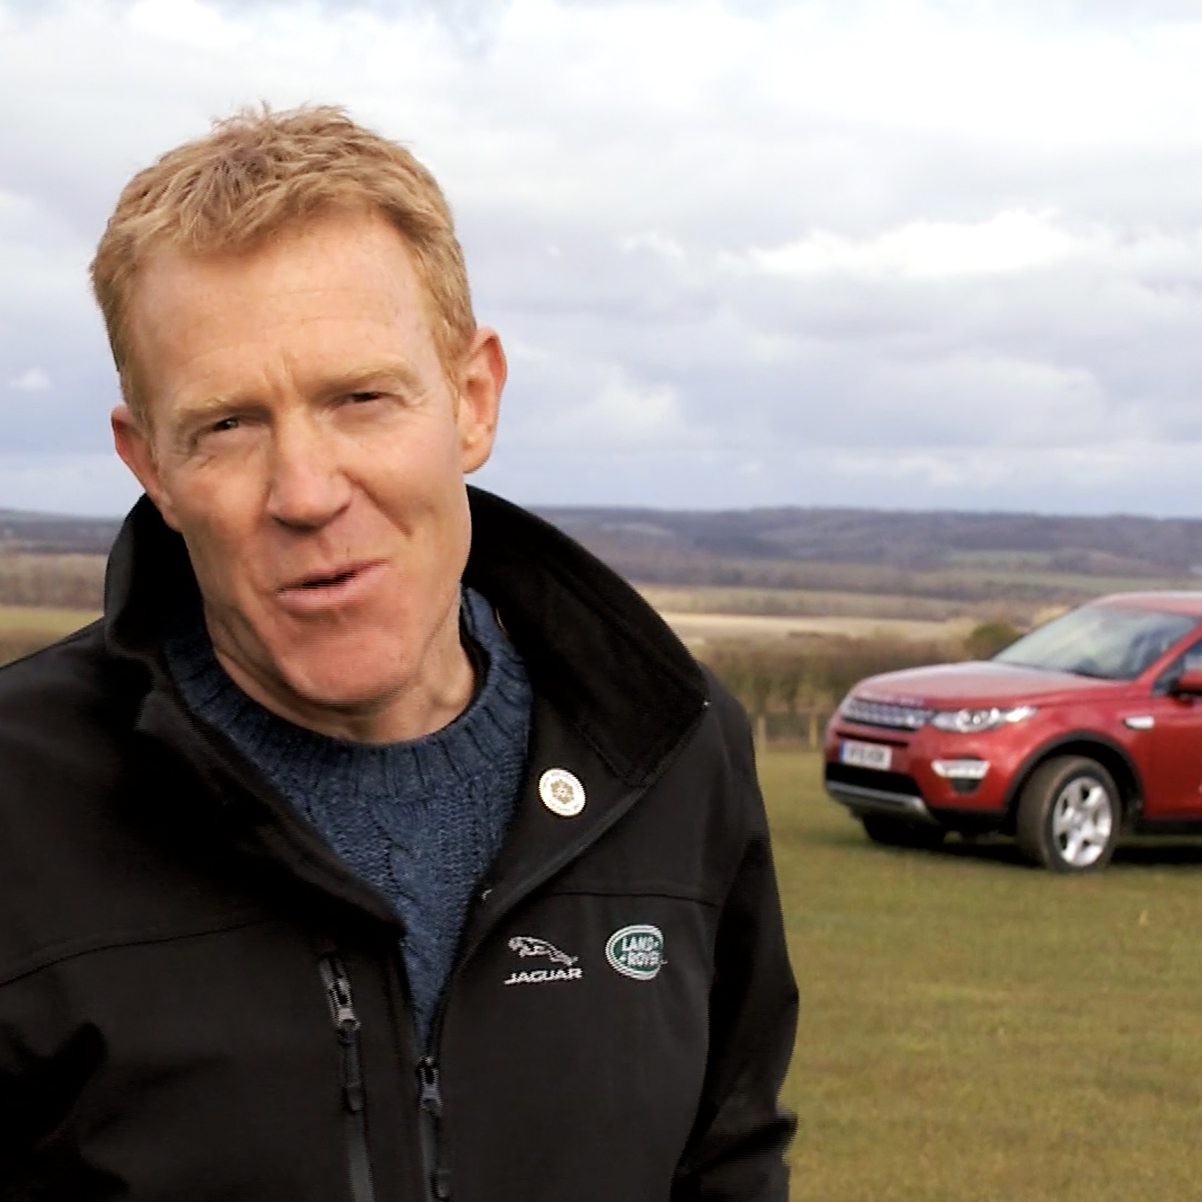 The Prince's Countryside Fund Land Rover Bursary